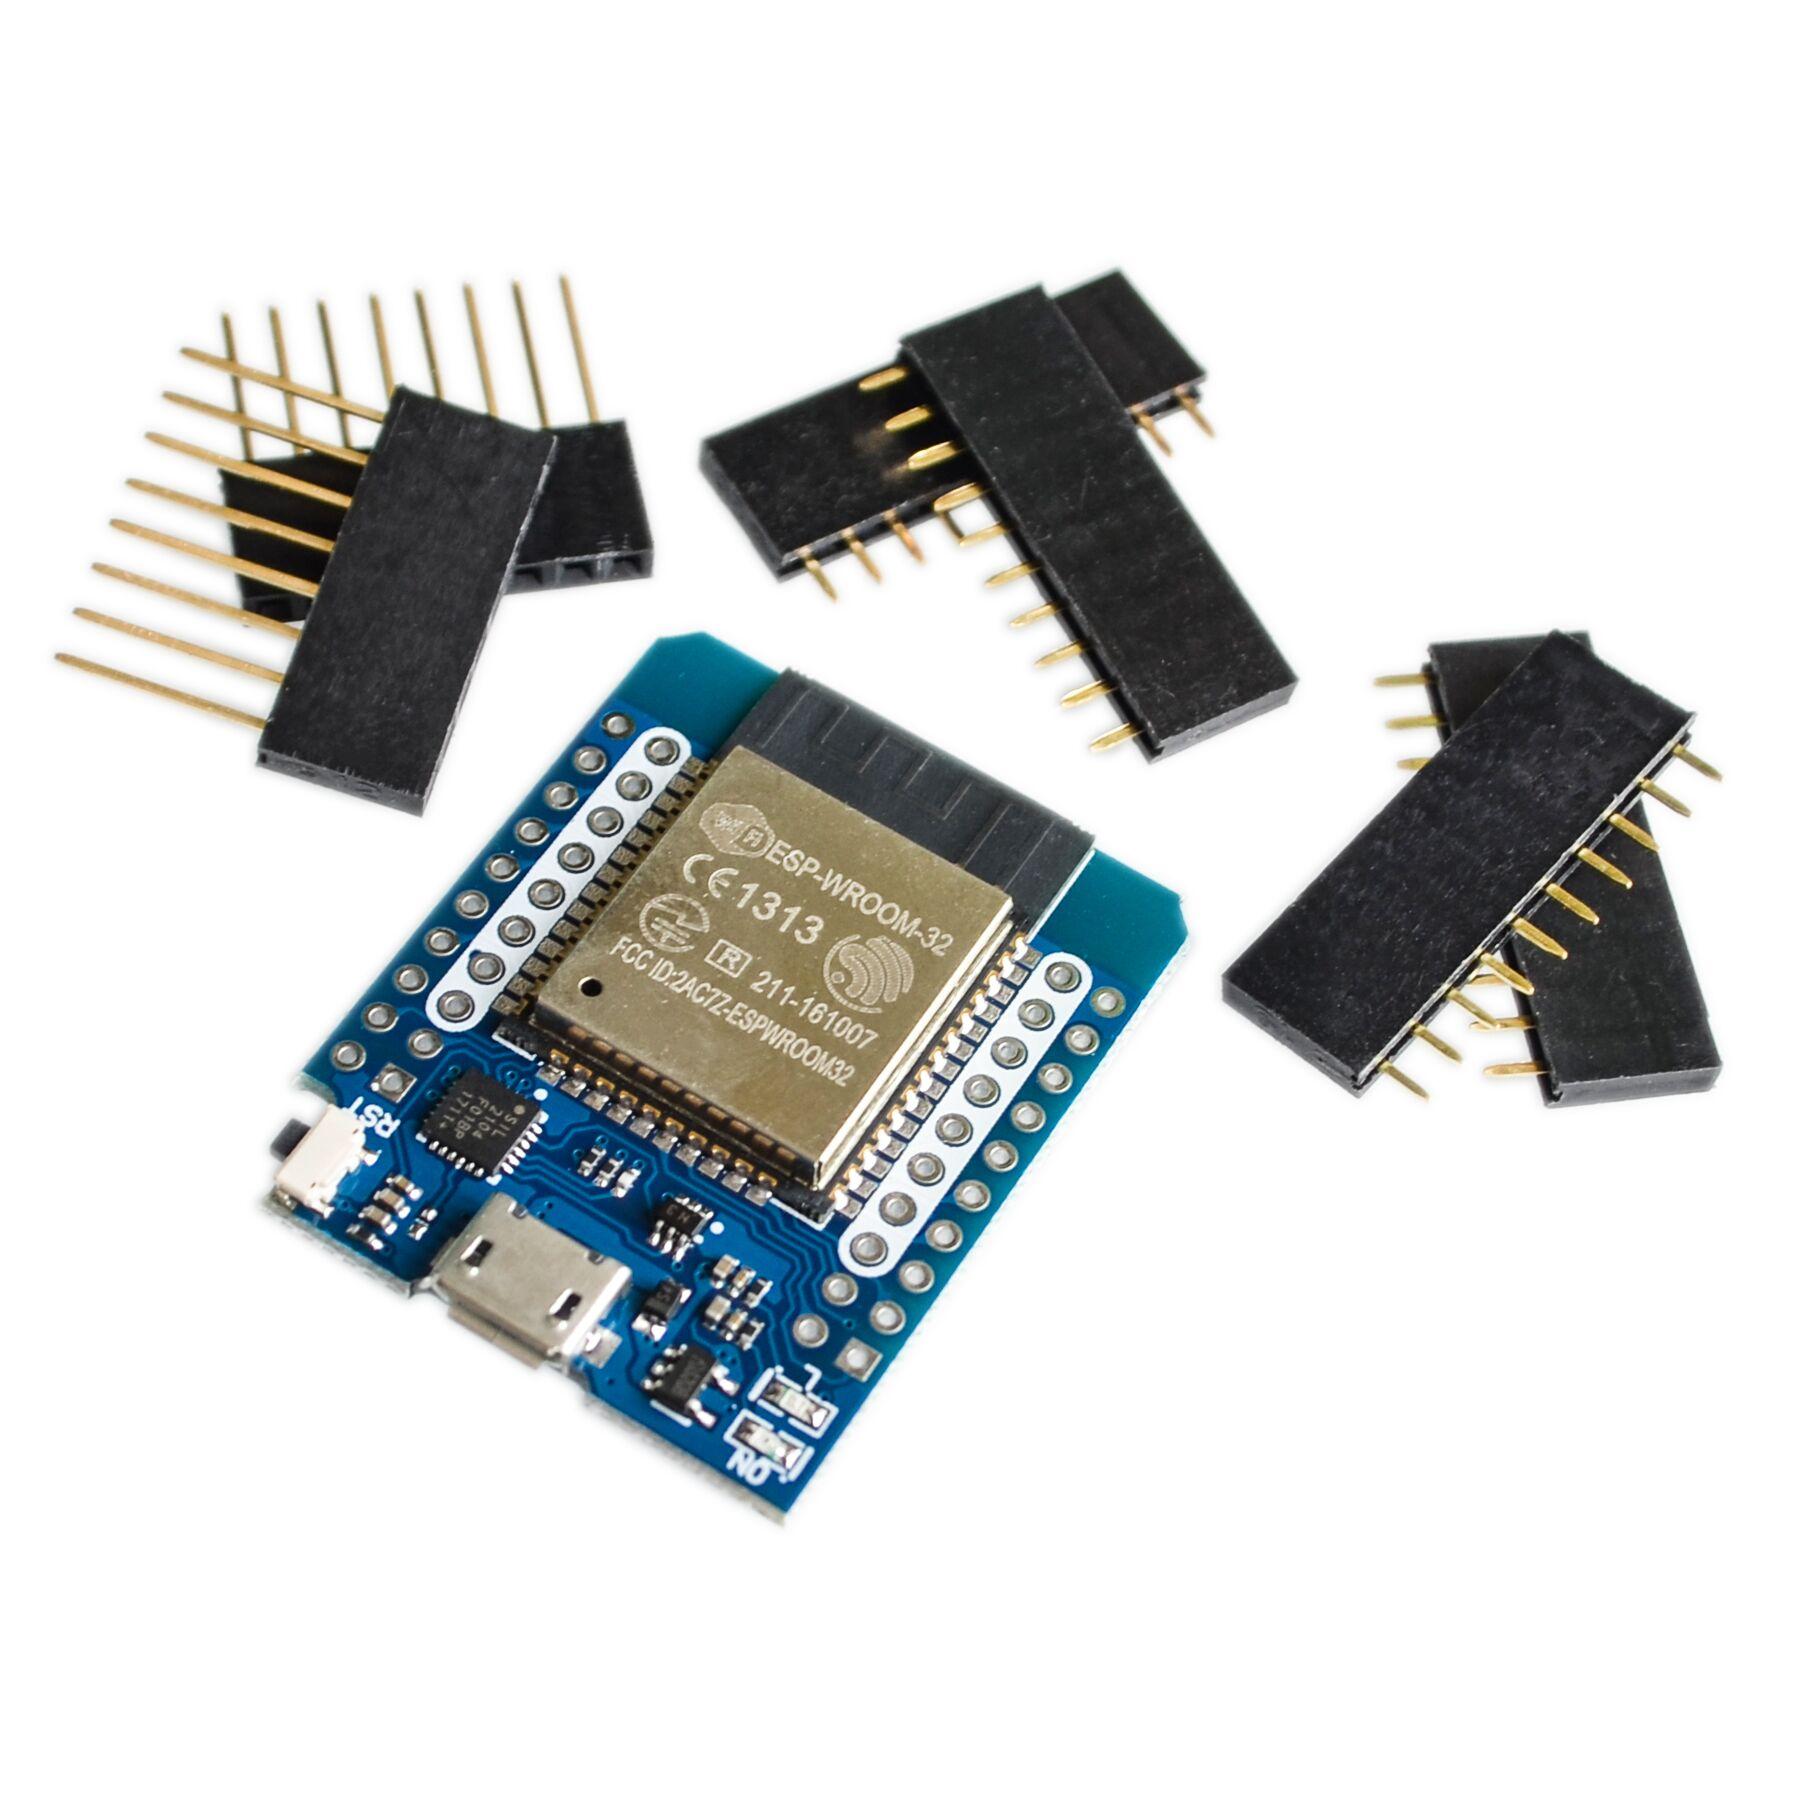 10PCS LOT LIVE D1 mini ESP32 ESP 32 WiFi Bluetooth Internet of Things development board based